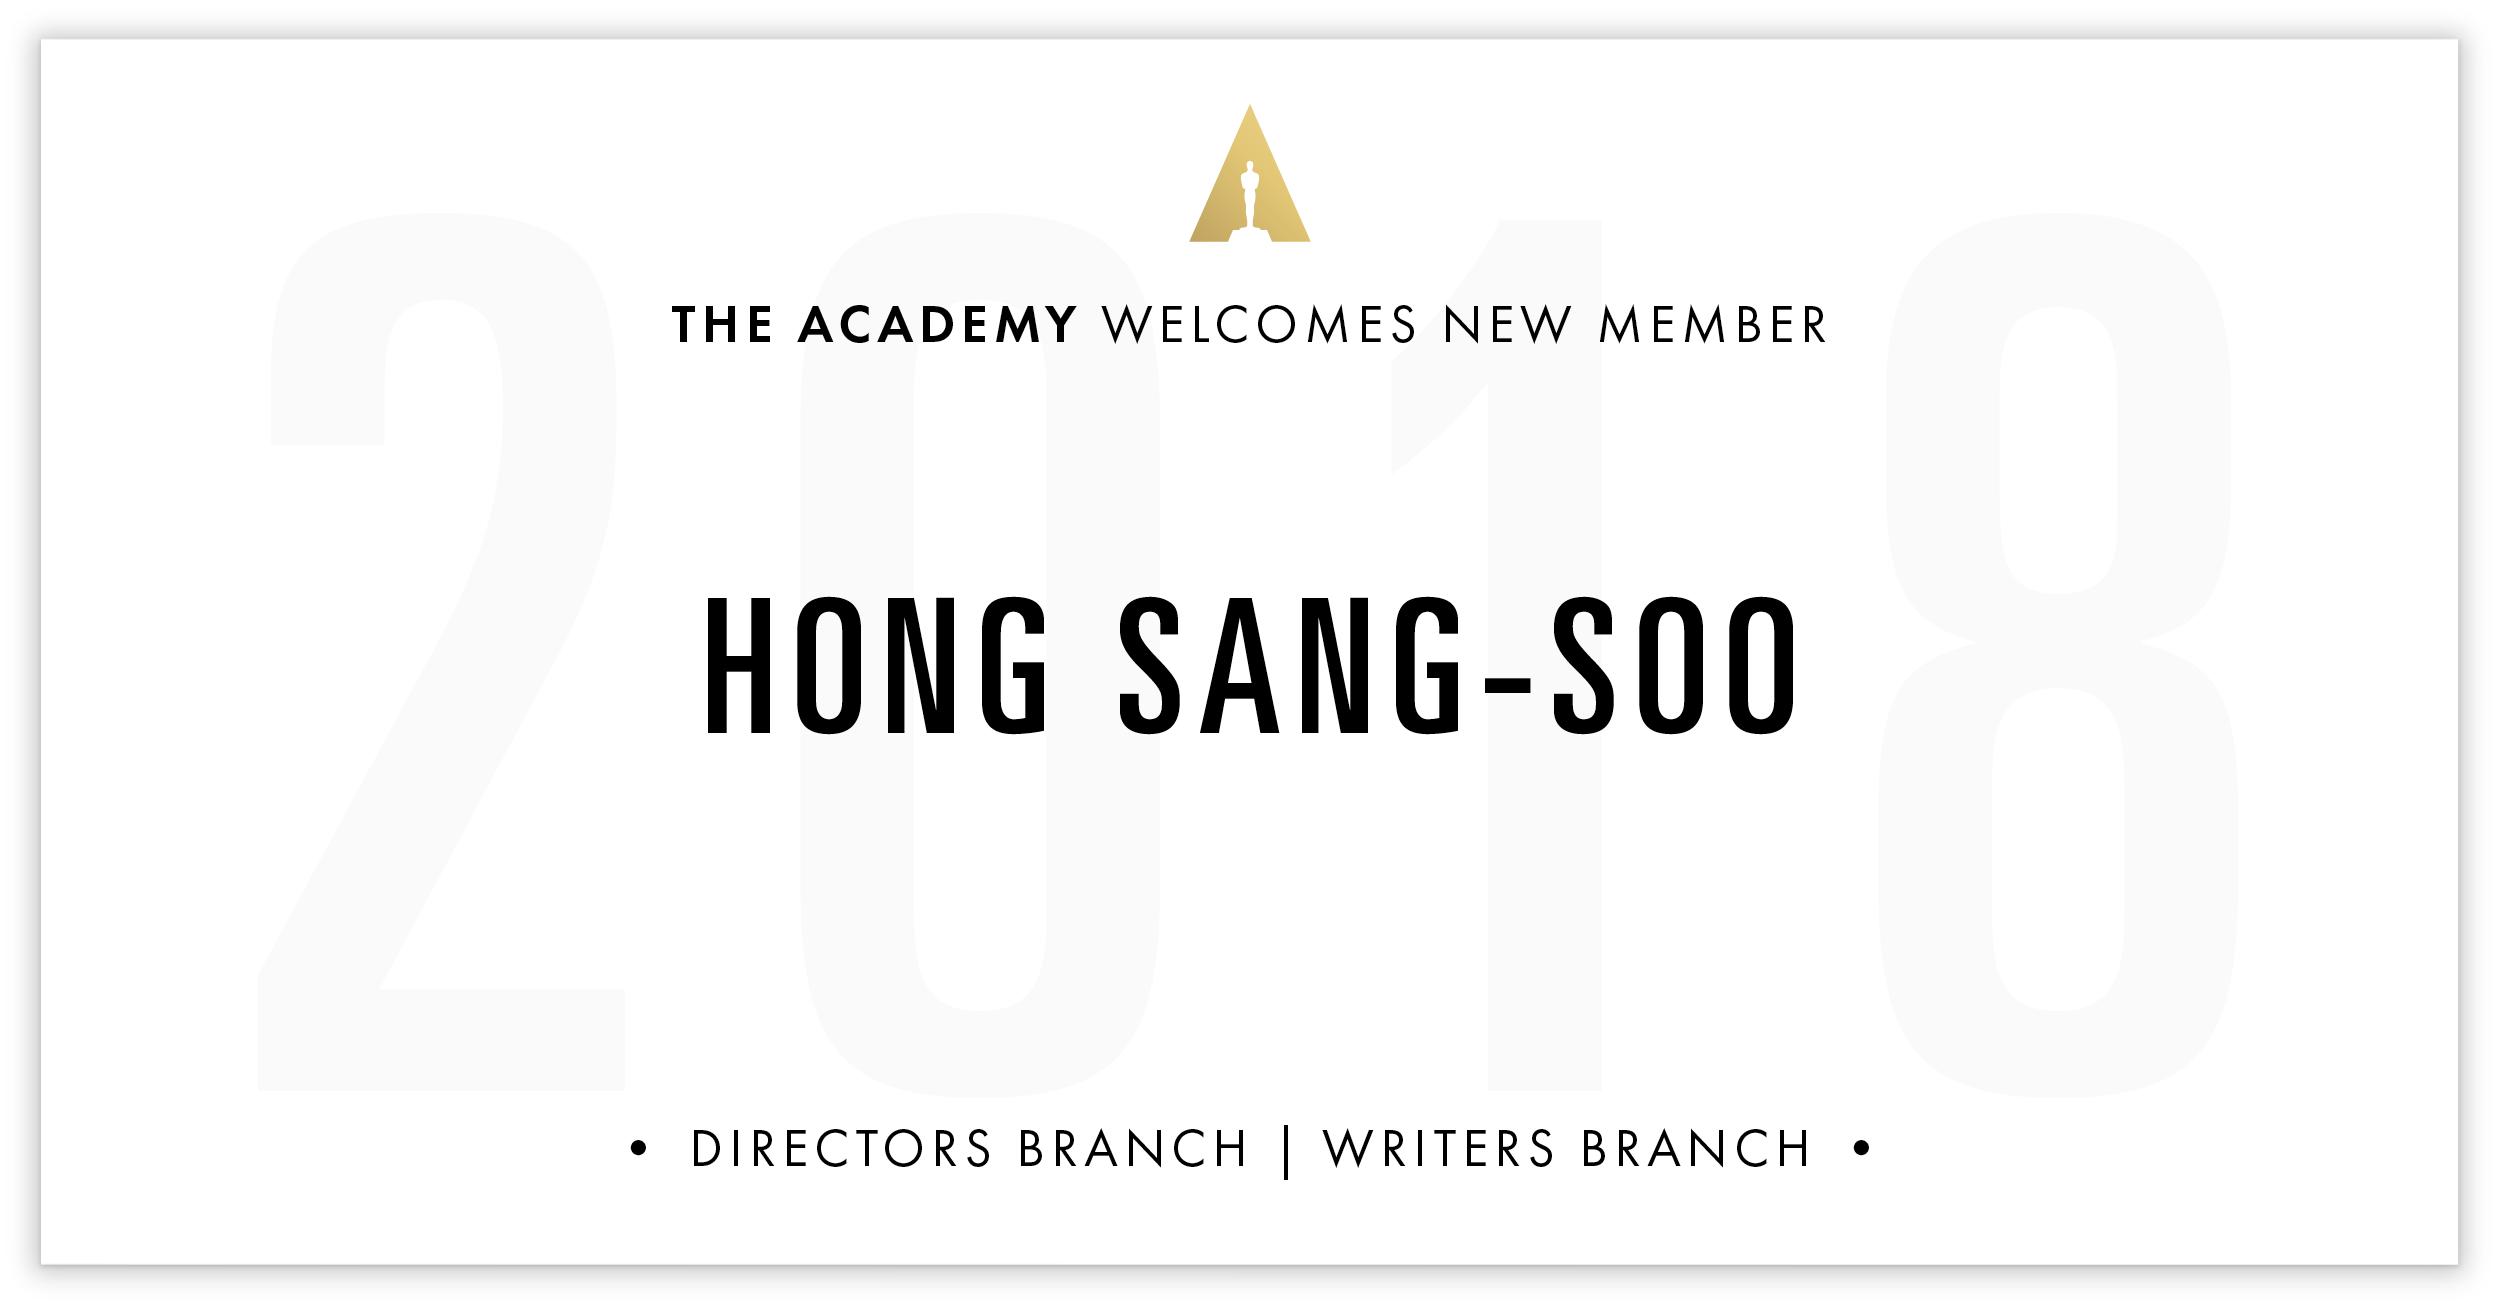 Hong Sang-soo is invited!